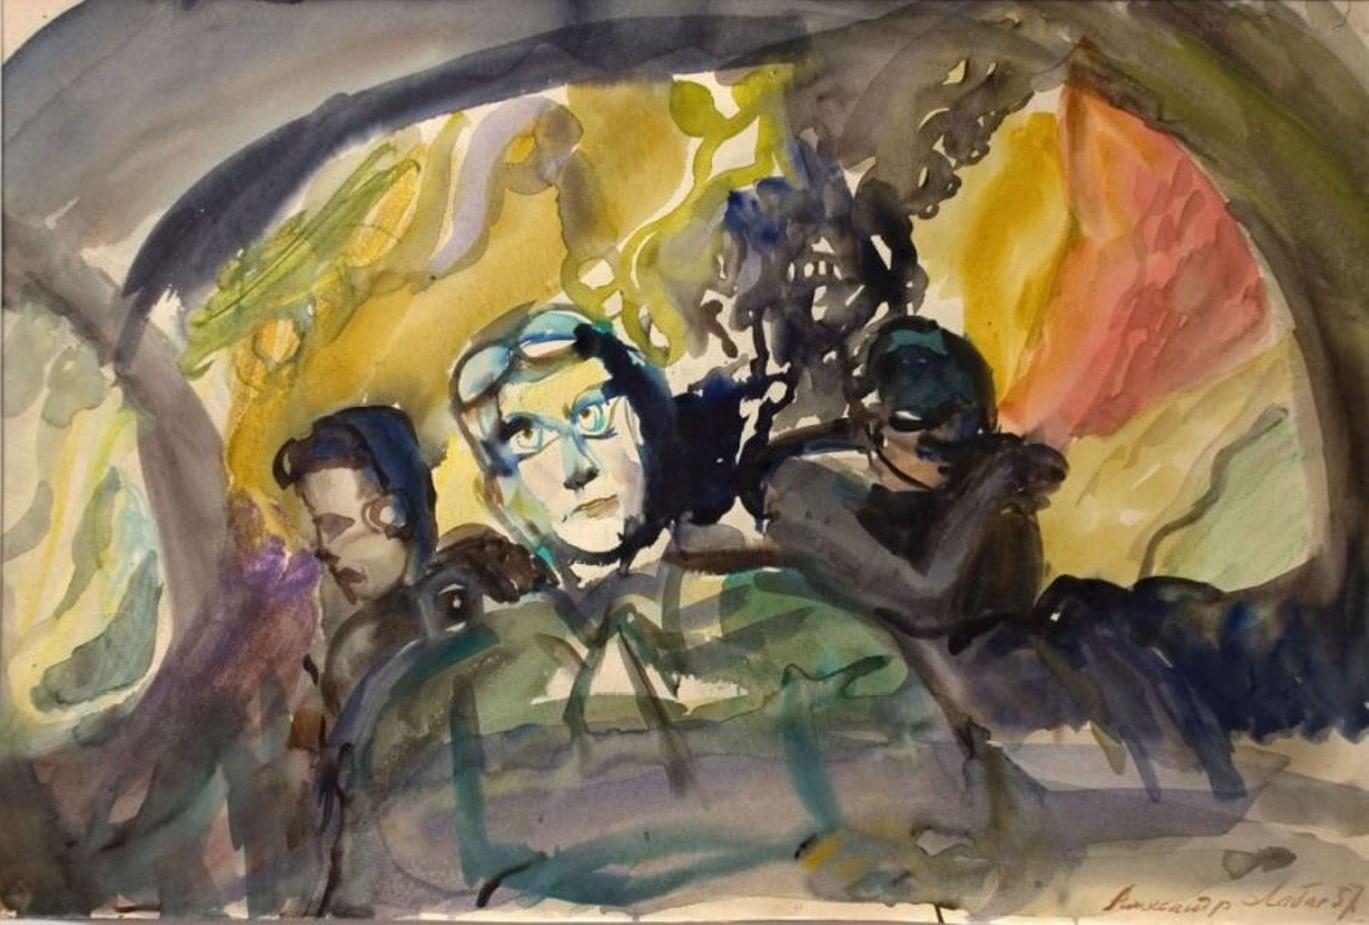 Рисунки Александра Лабаса о Хиросиме покажут в Москве. Галерея 1